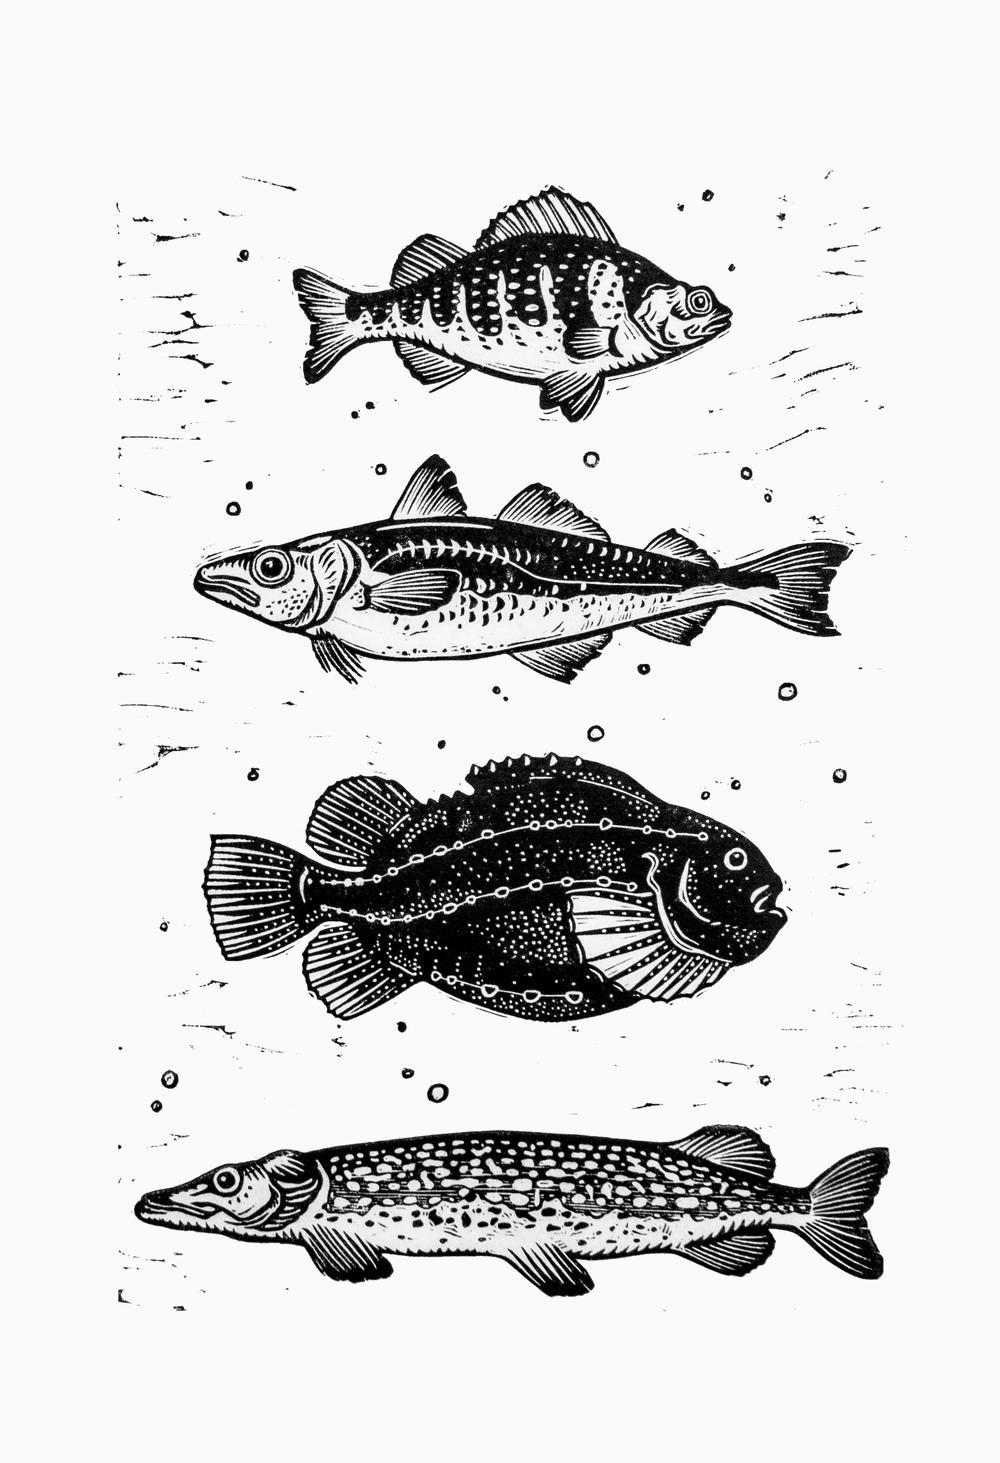 reeled-in-fish-linocut-print-final-narrow-border.jpg